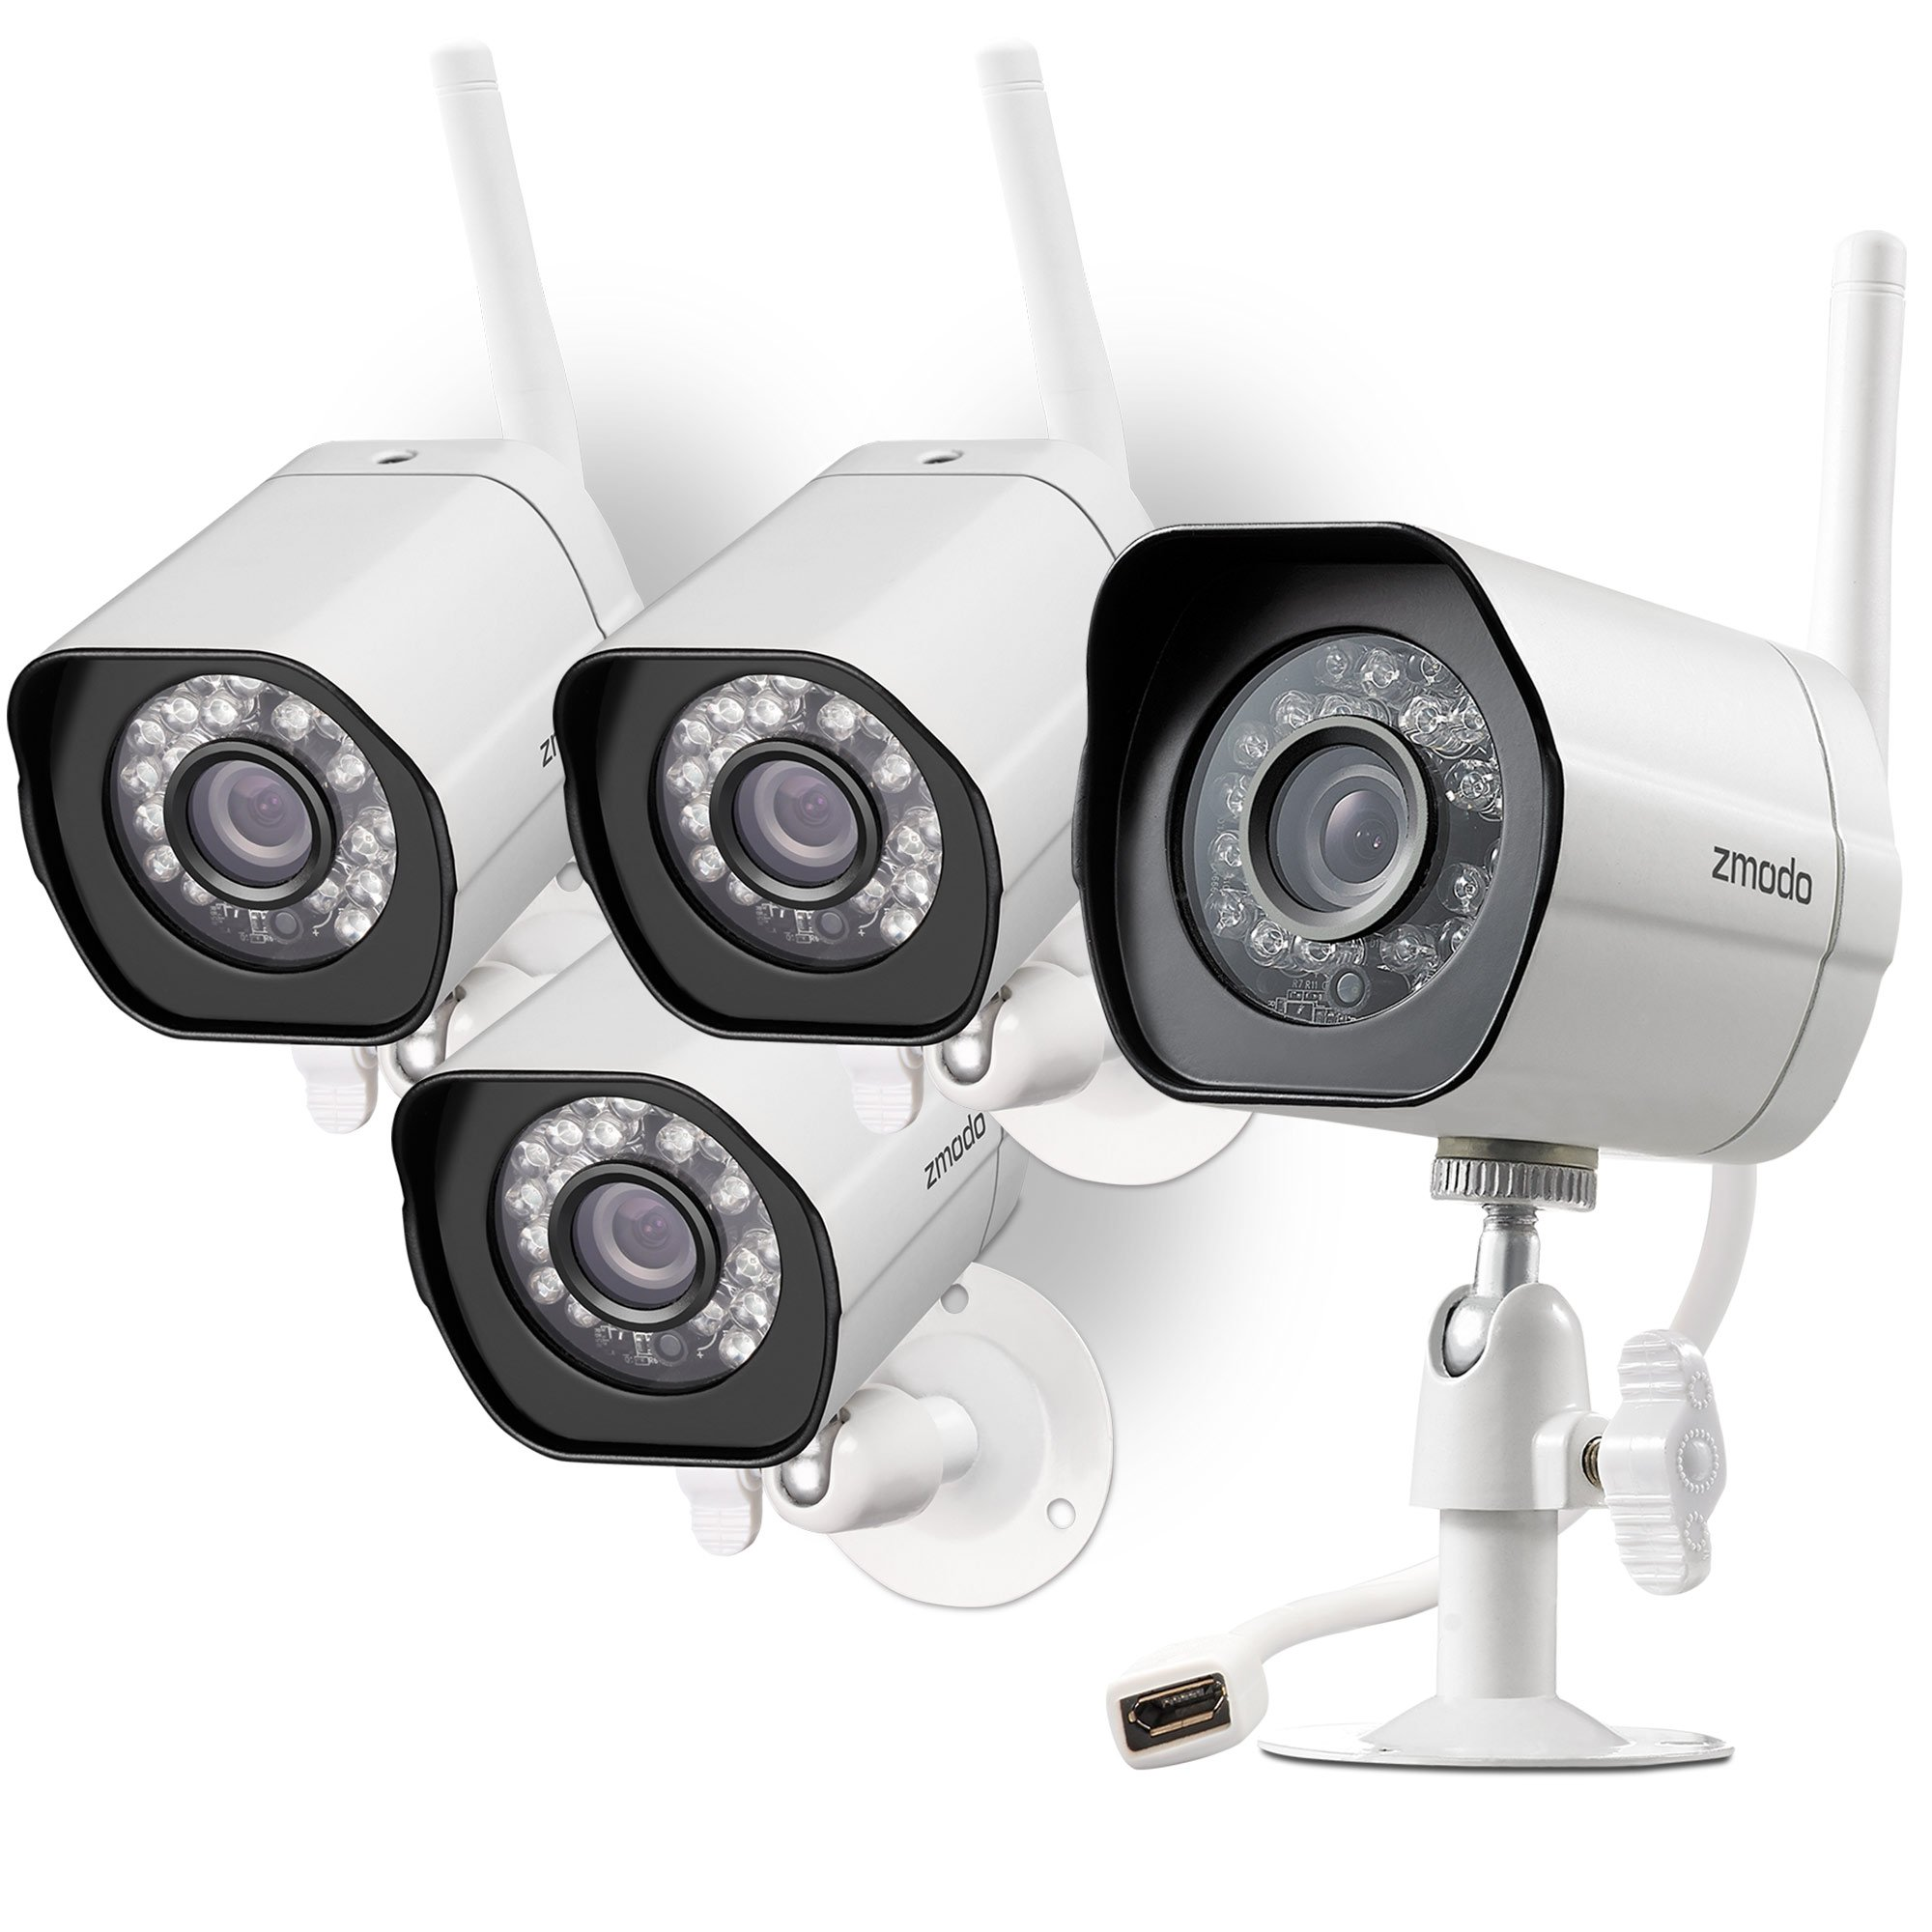 Zmodo Wireless Security Outdoor Recording